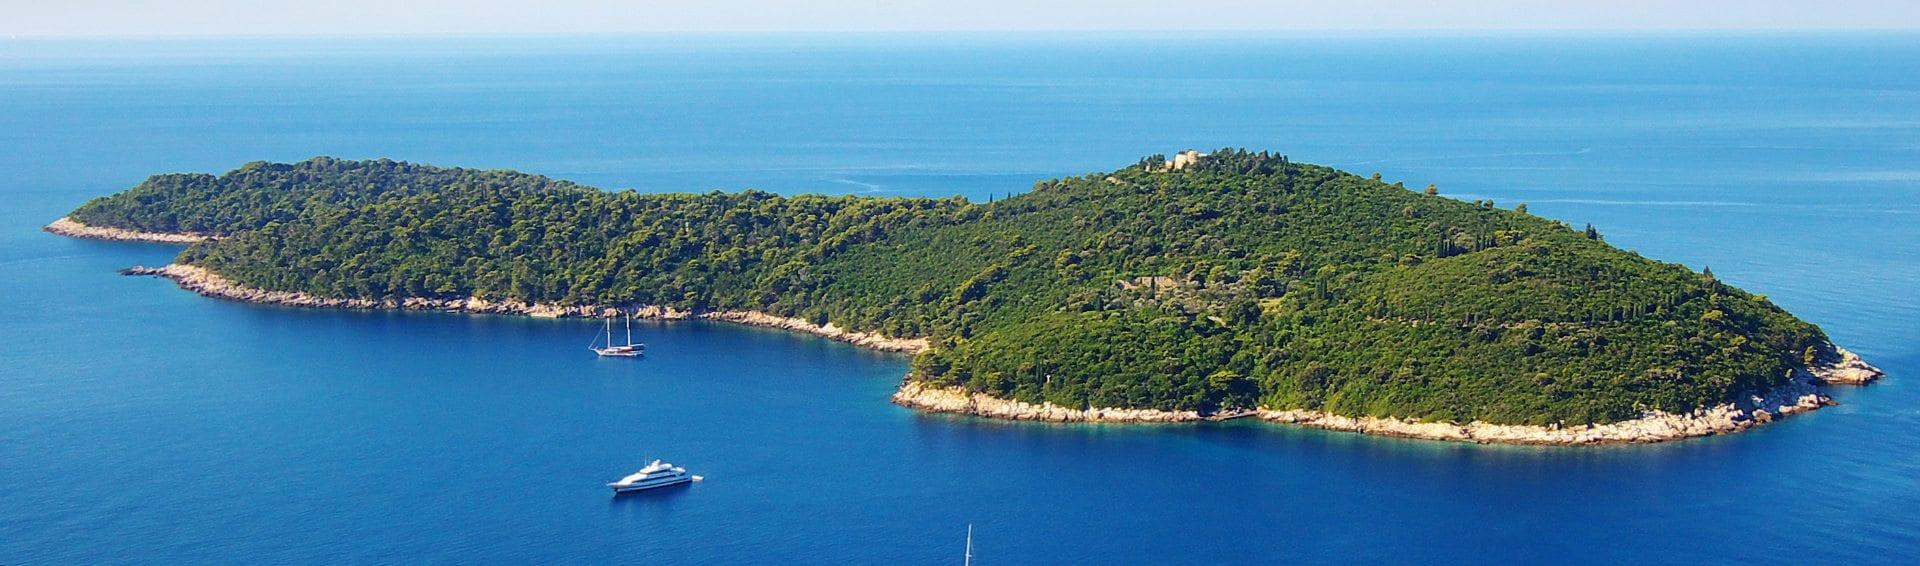 Croatia | Hvar